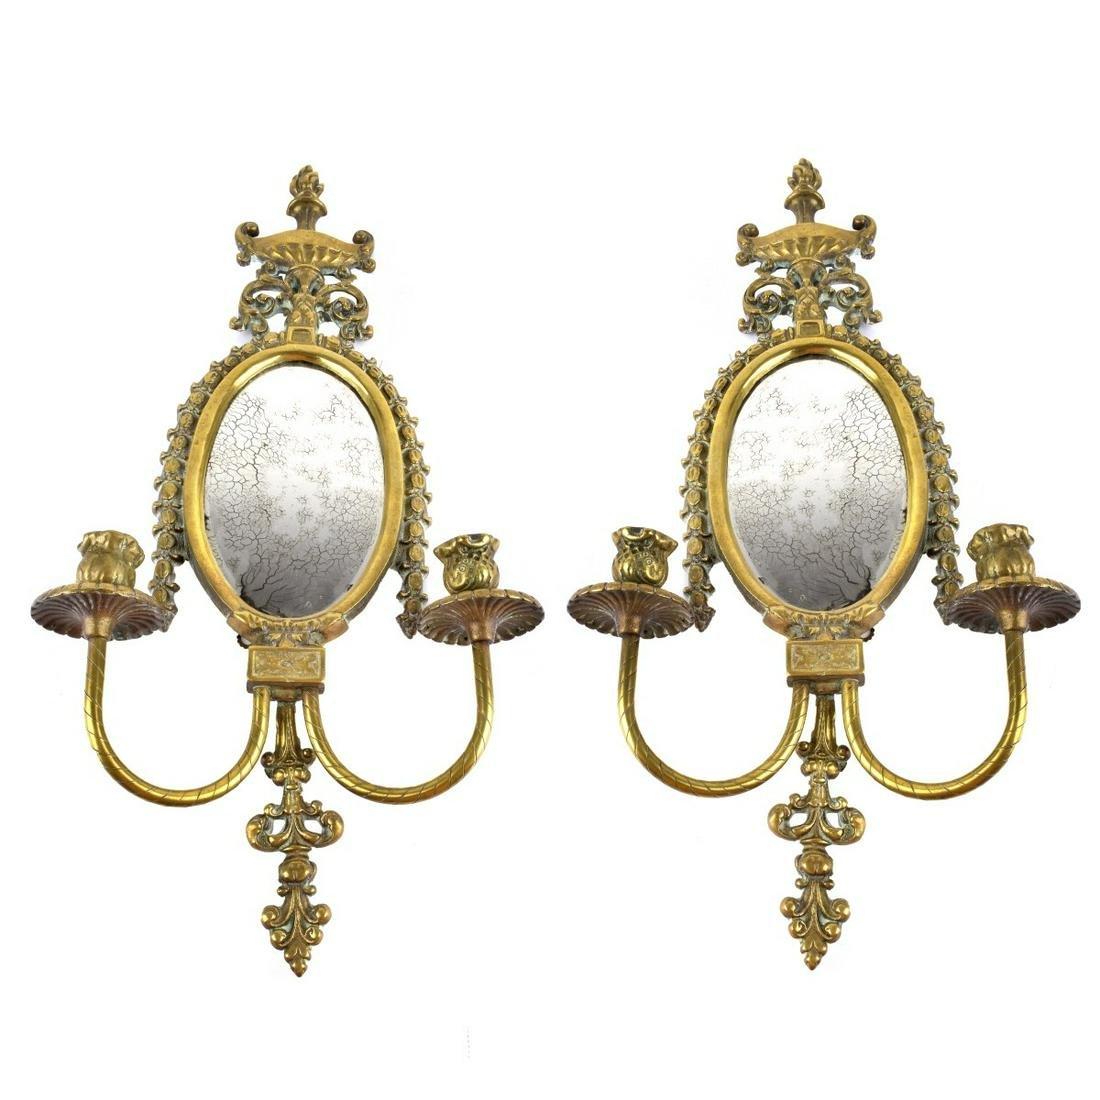 Pair of Louis XVI Style Sconces